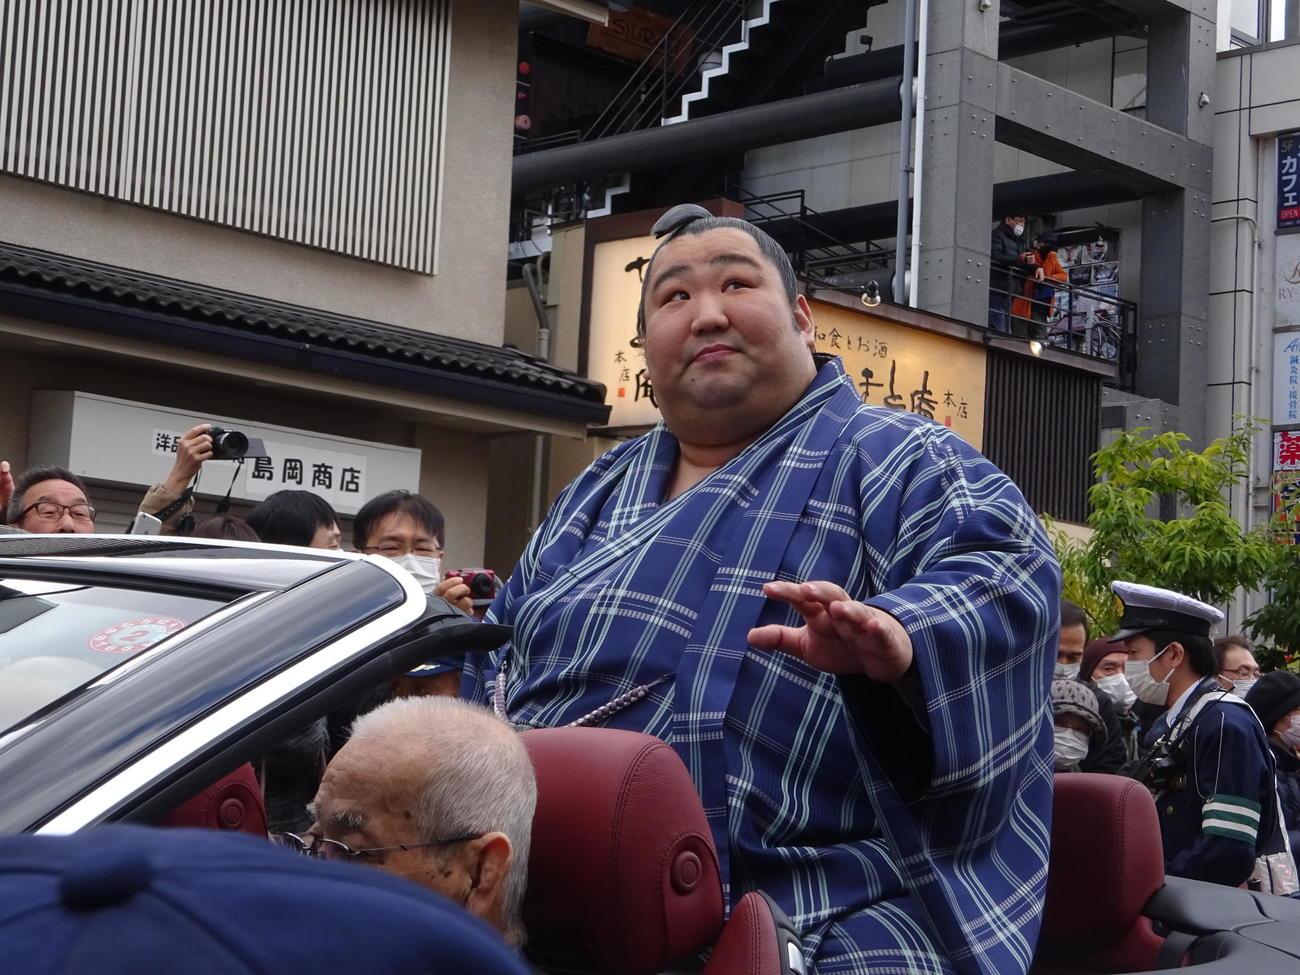 JR奈良駅前からオープンカーで優勝パレードを行う徳勝龍(撮影・加藤裕一)